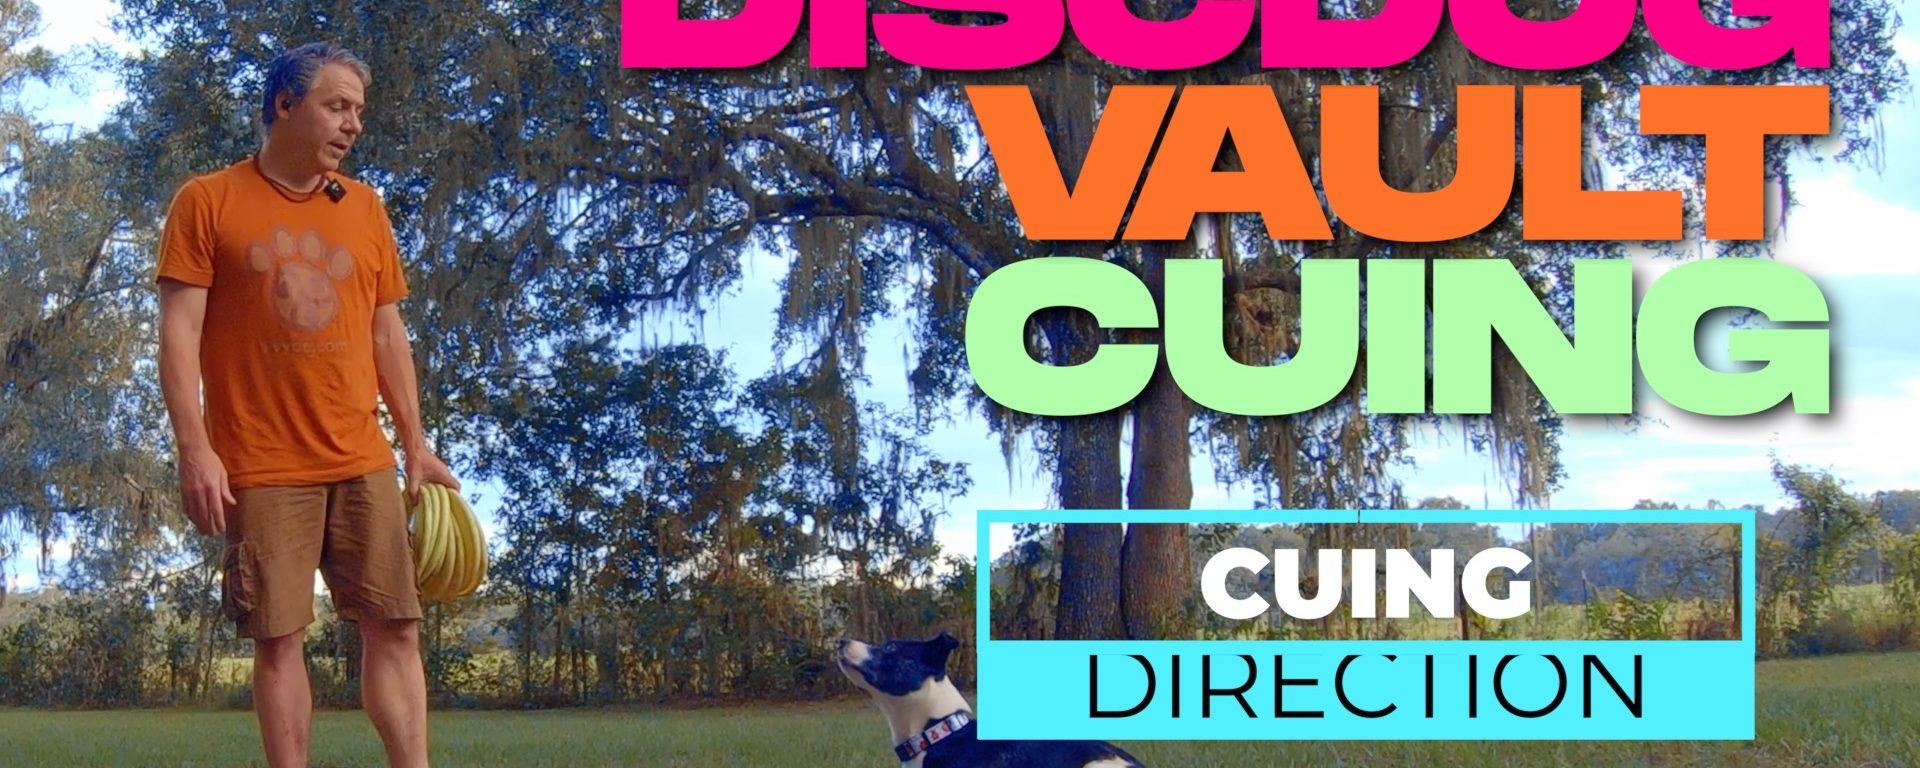 Disc Dog Vault Training | Cuing Direction